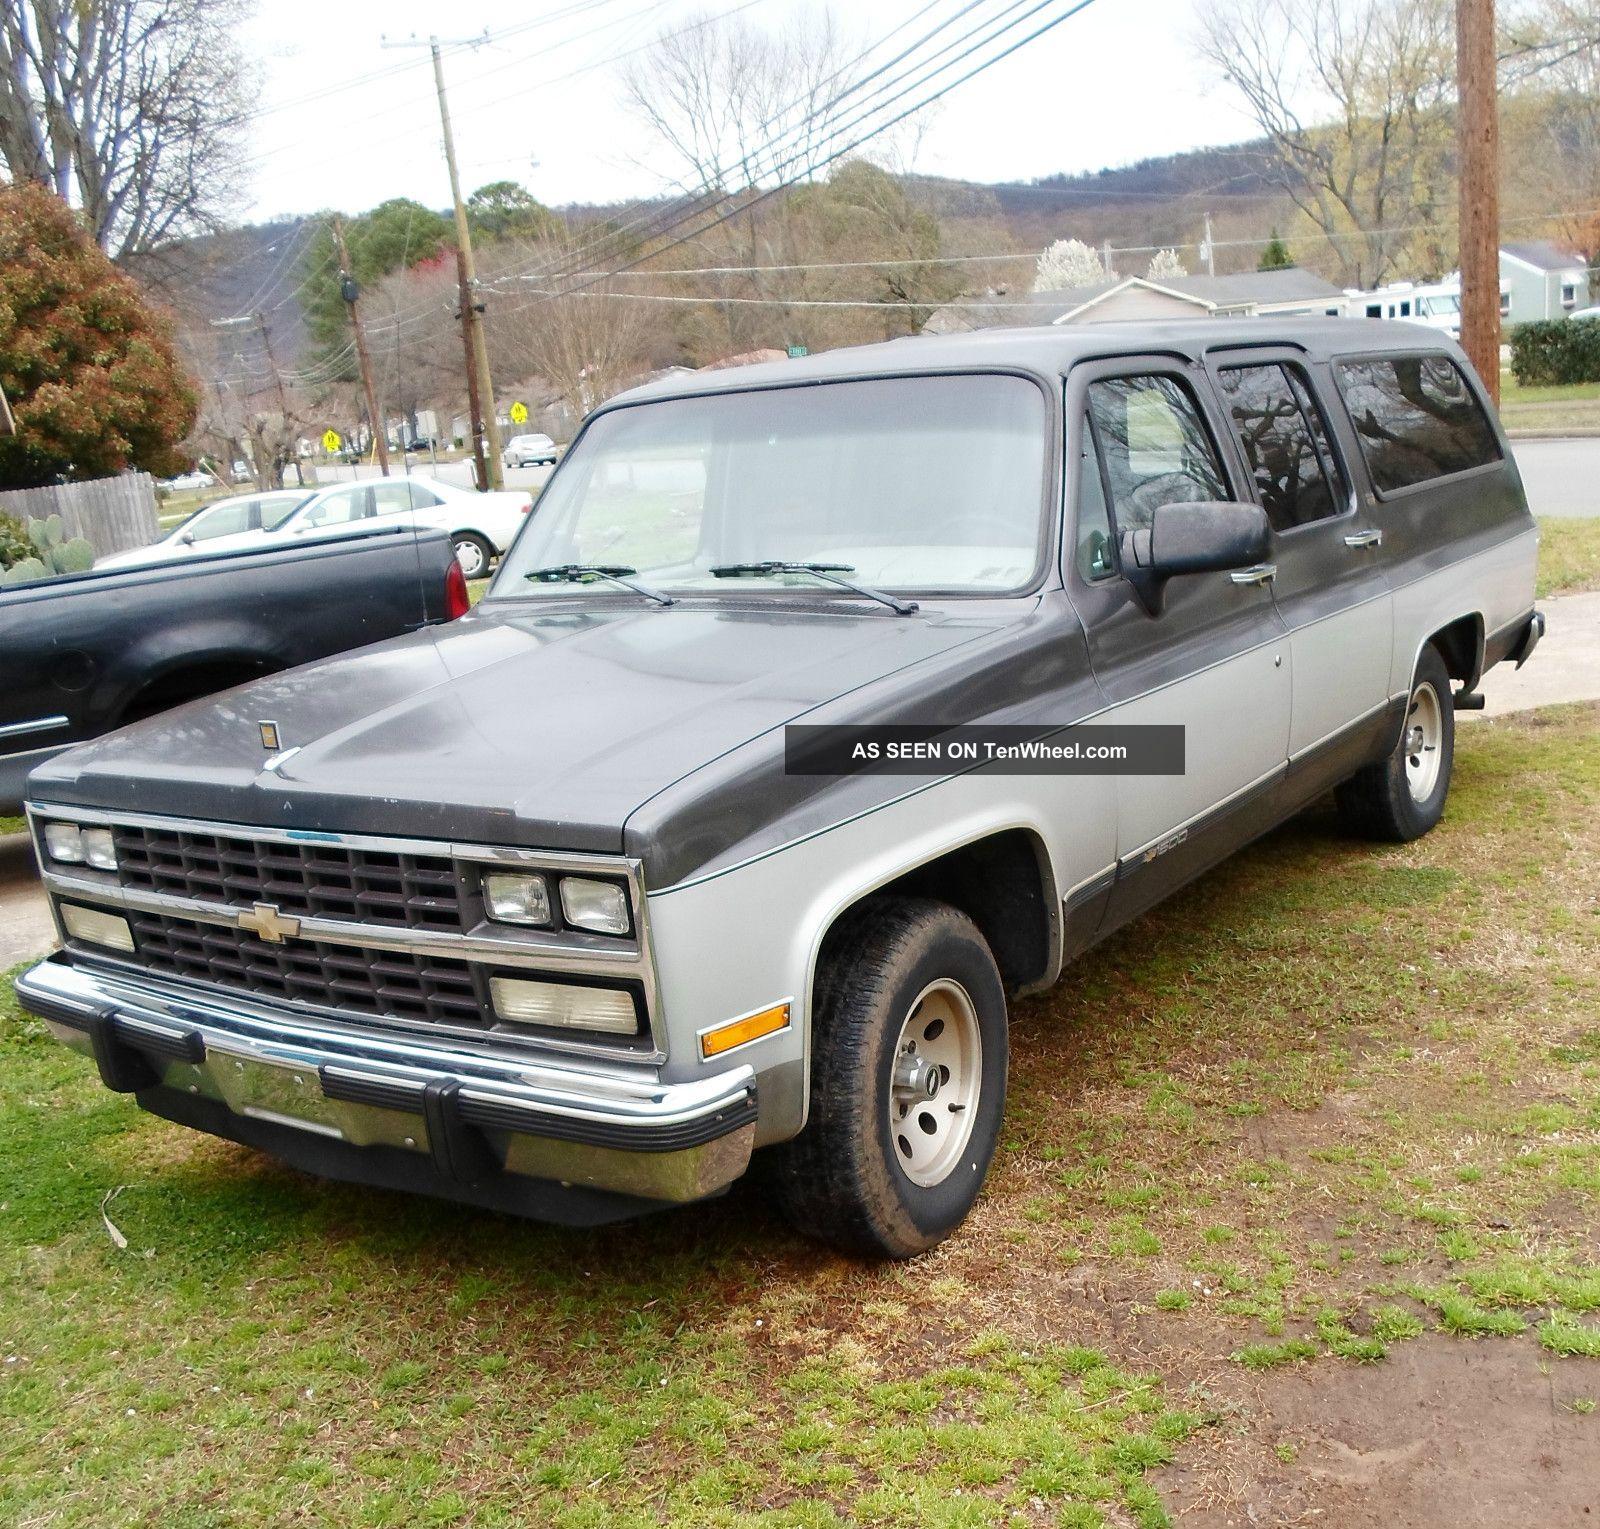 1991 chevy silverado suburban 1500 9 passenger no rust. Black Bedroom Furniture Sets. Home Design Ideas